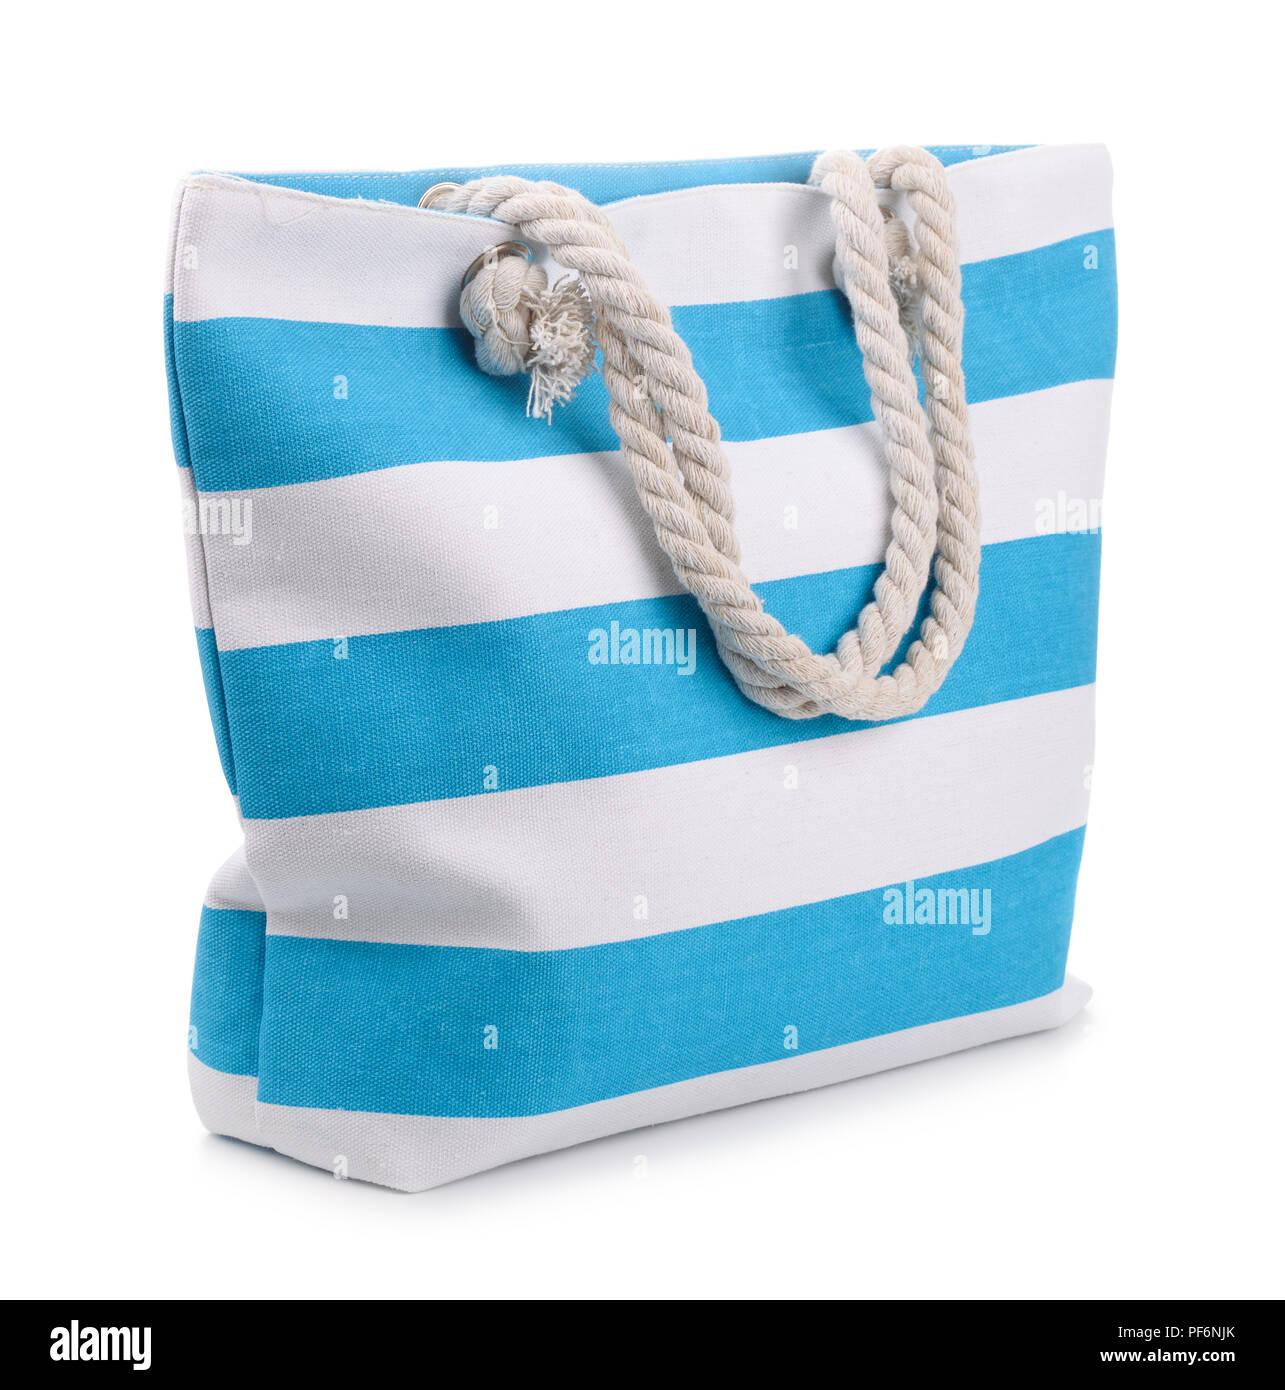 5e7b37e78 Blue striped beach bag isolated on white Stock Photo: 215892955 - Alamy